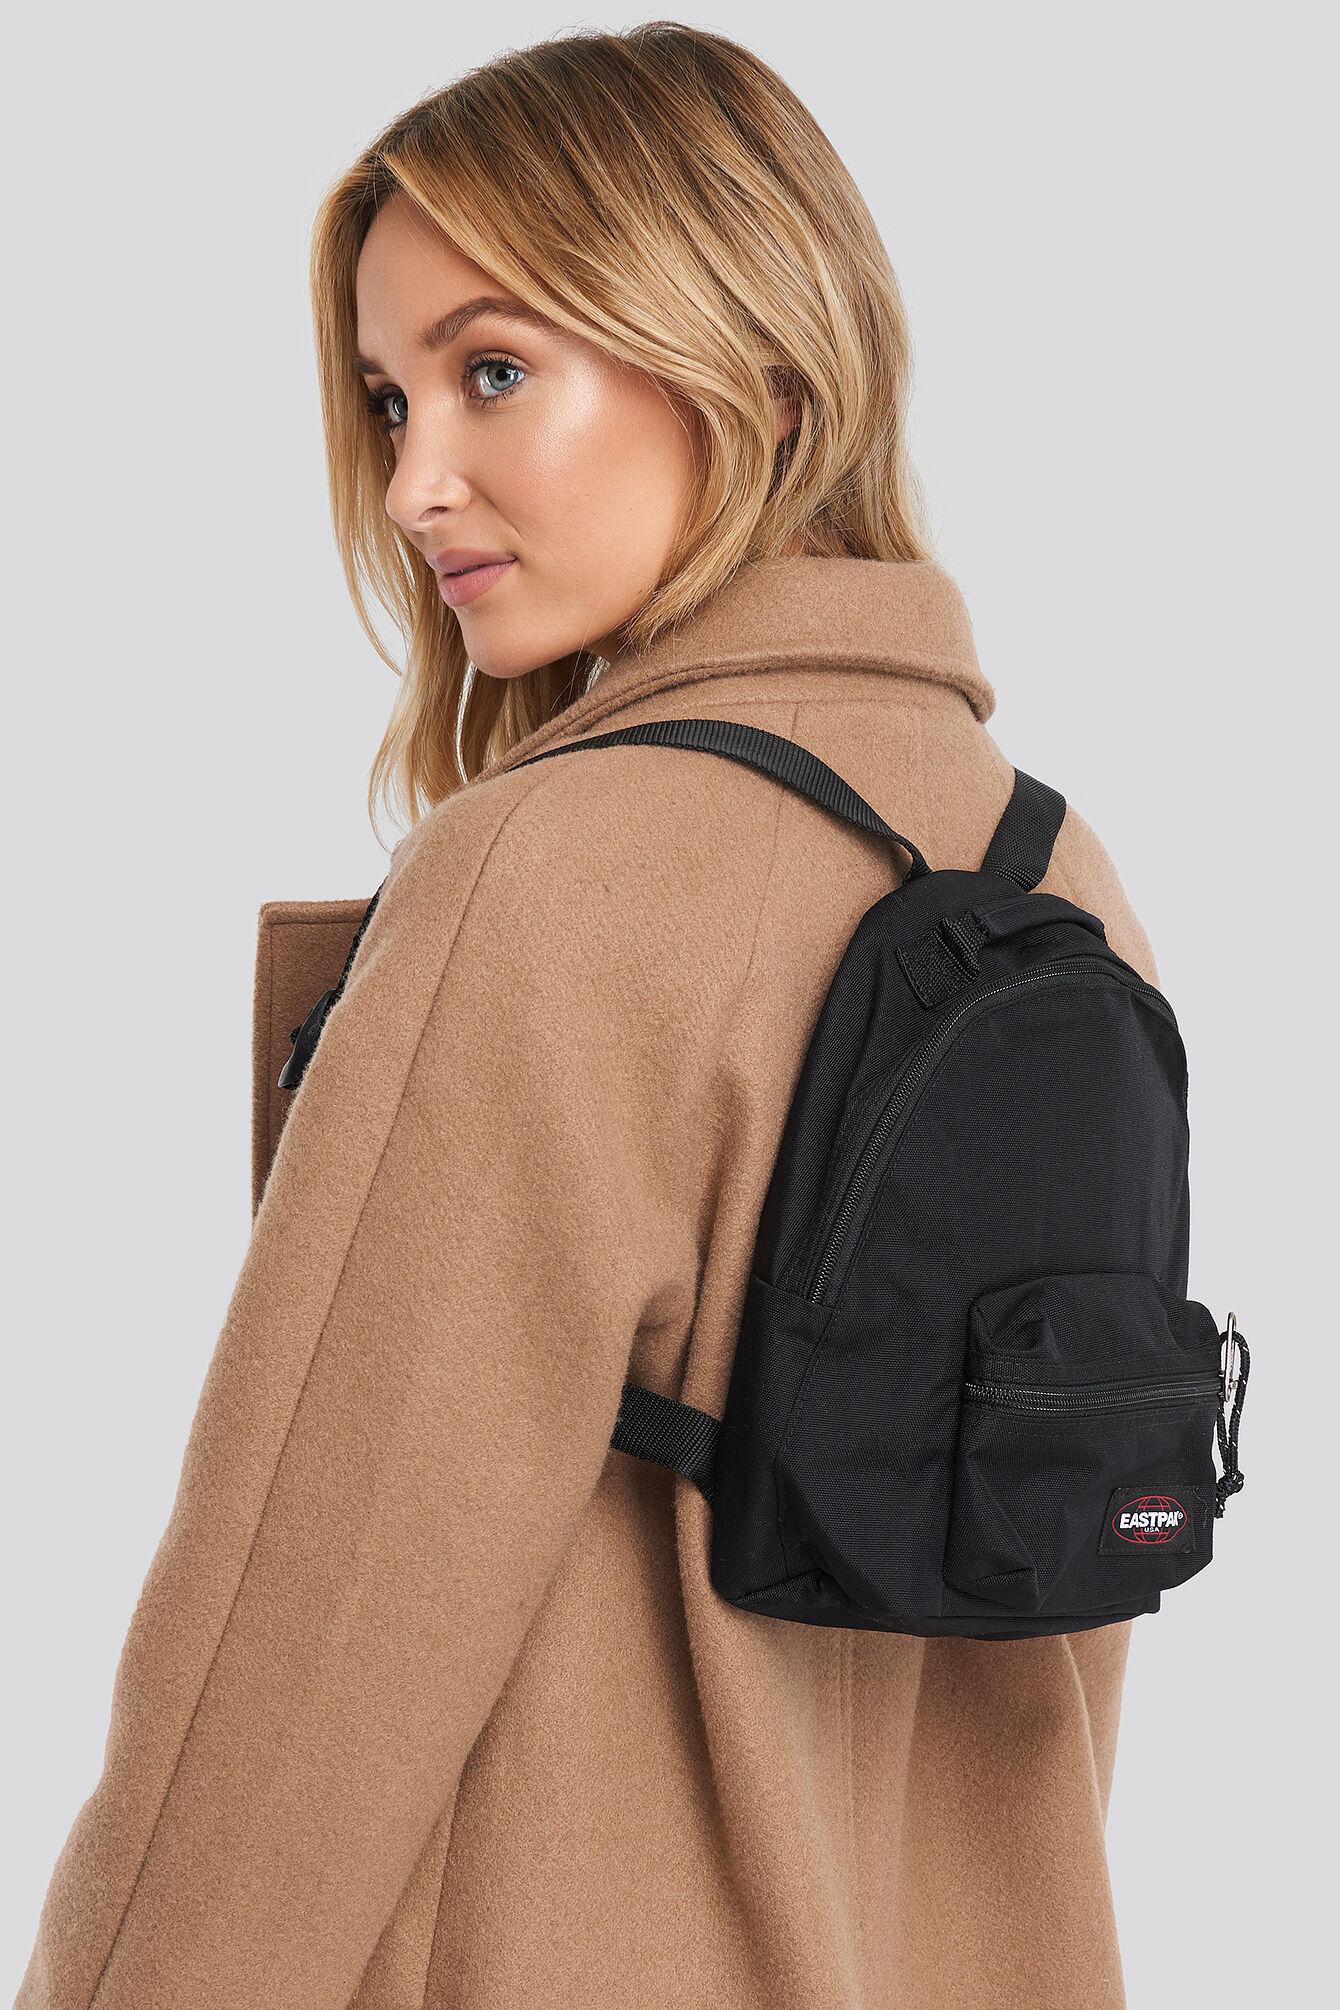 Eastpak Orbit W Bag - Black  - Size: One Size